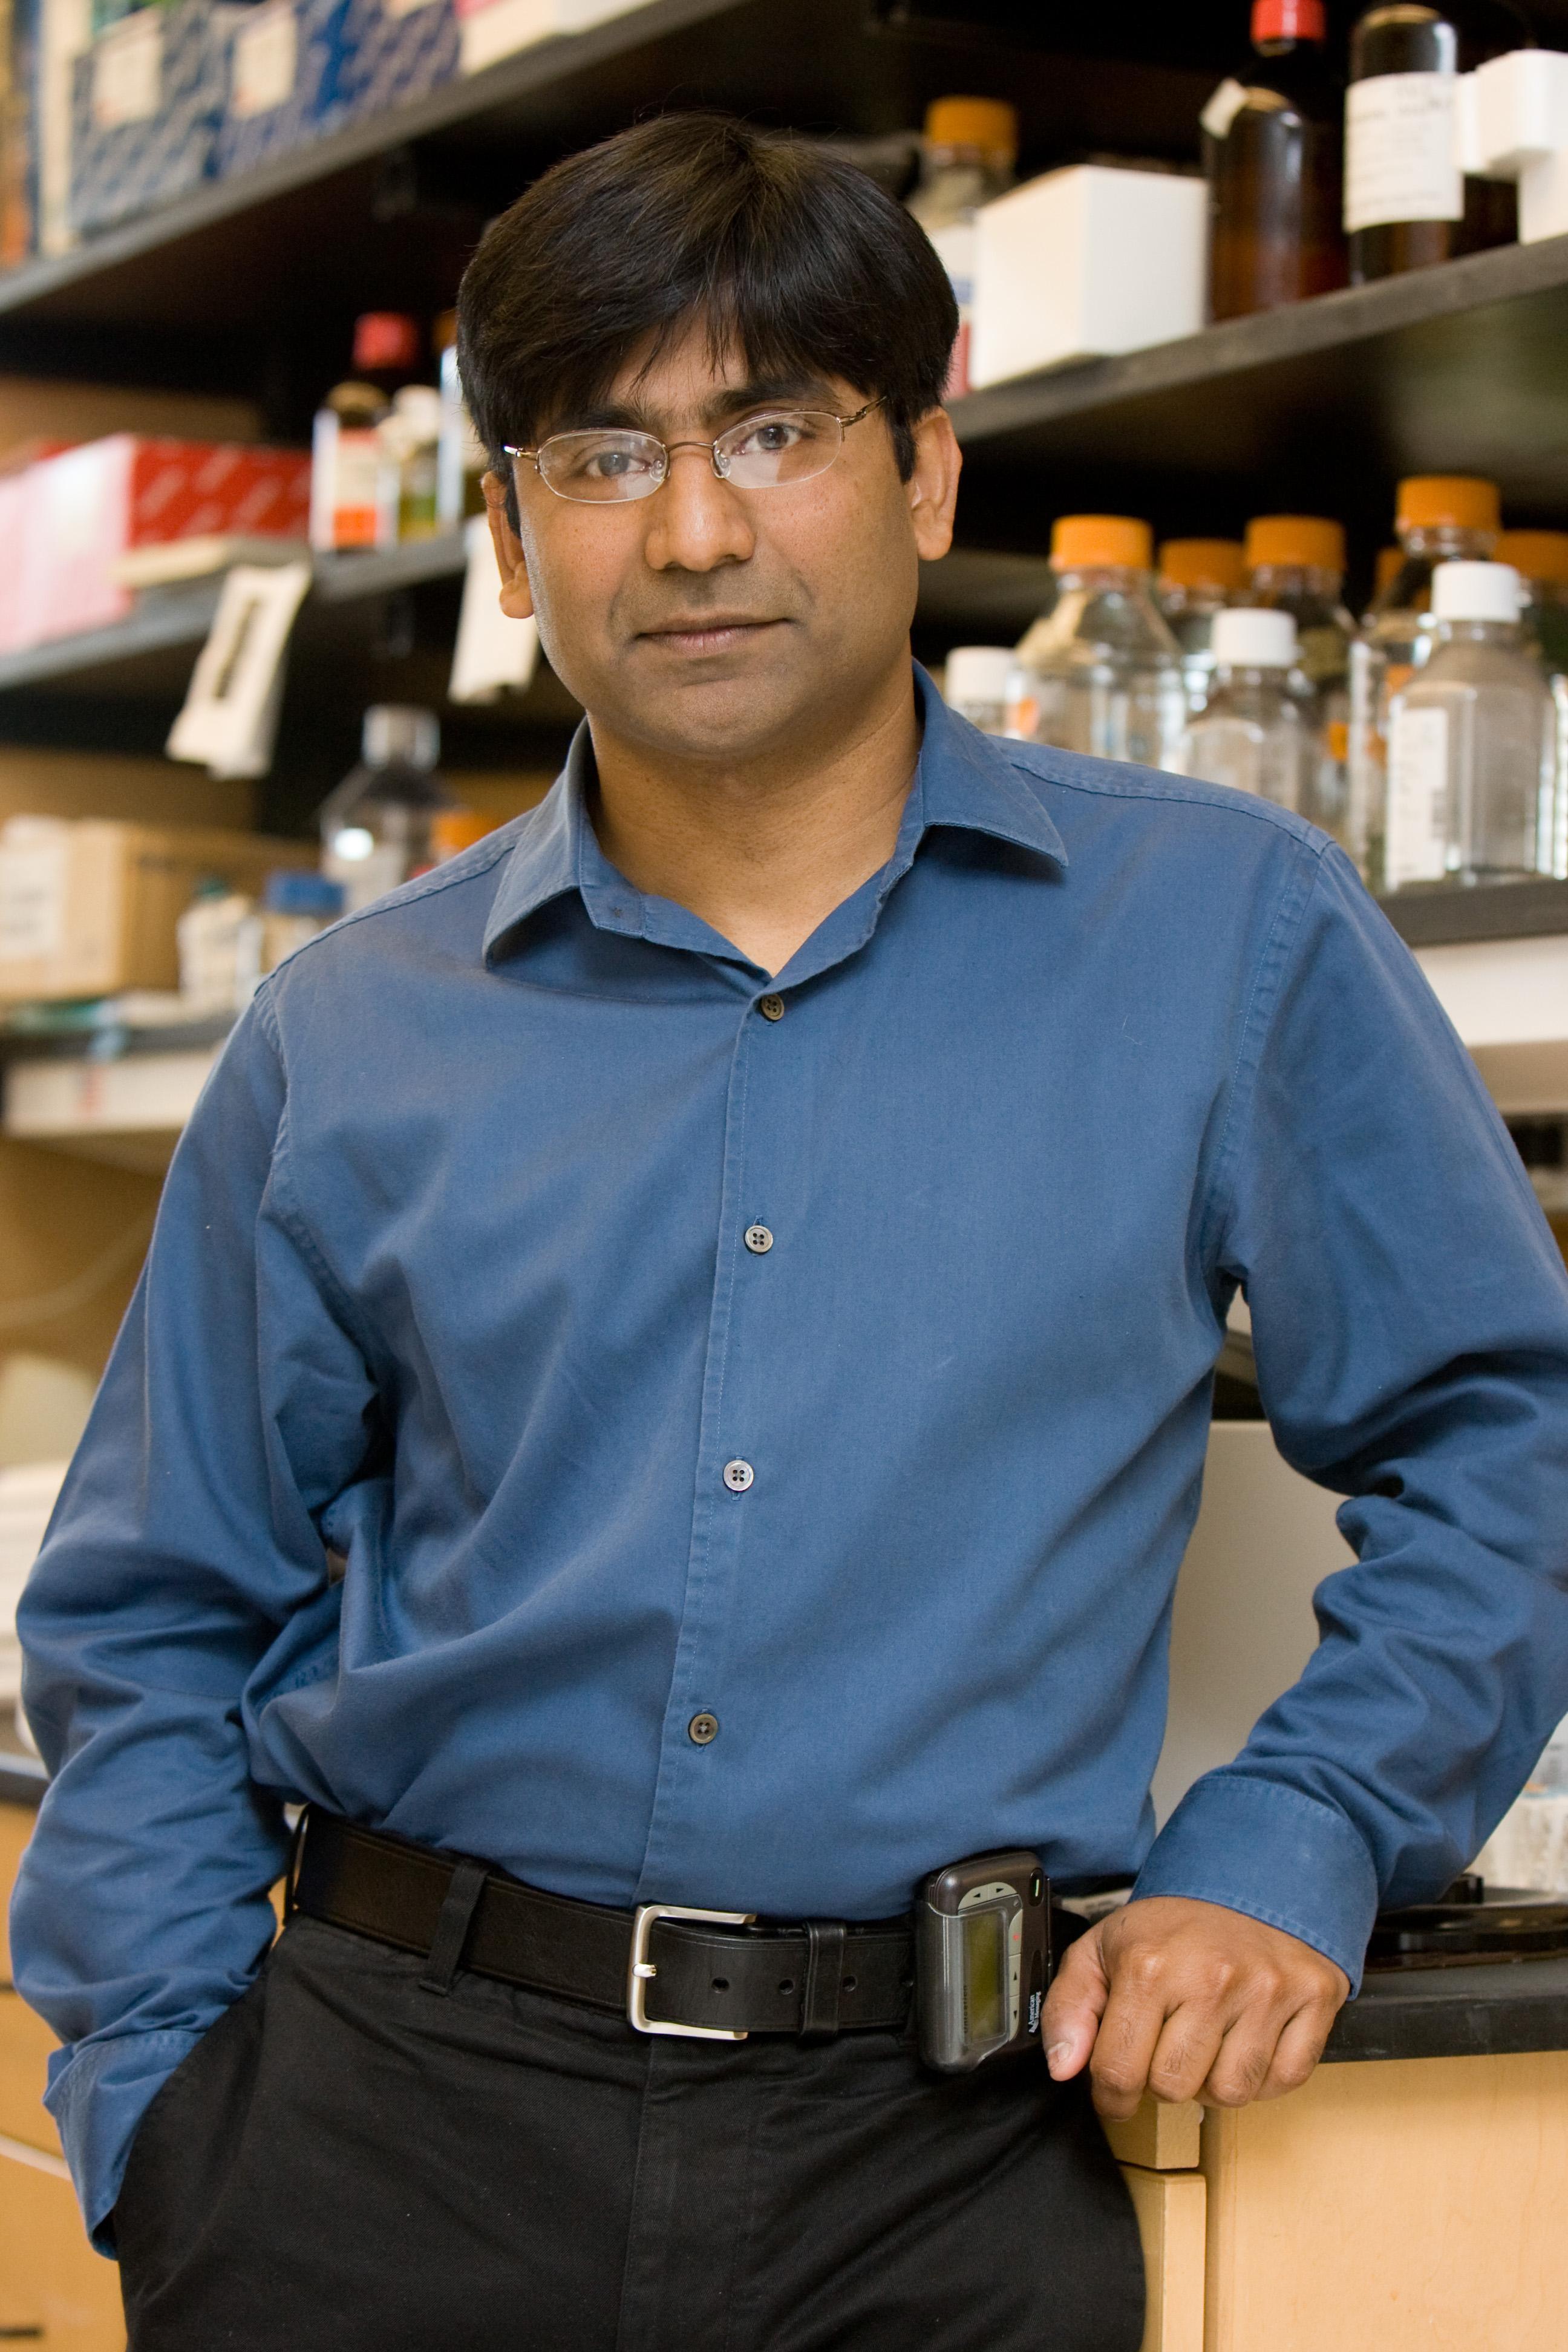 Dr. Pavan Reddy stands in his lab